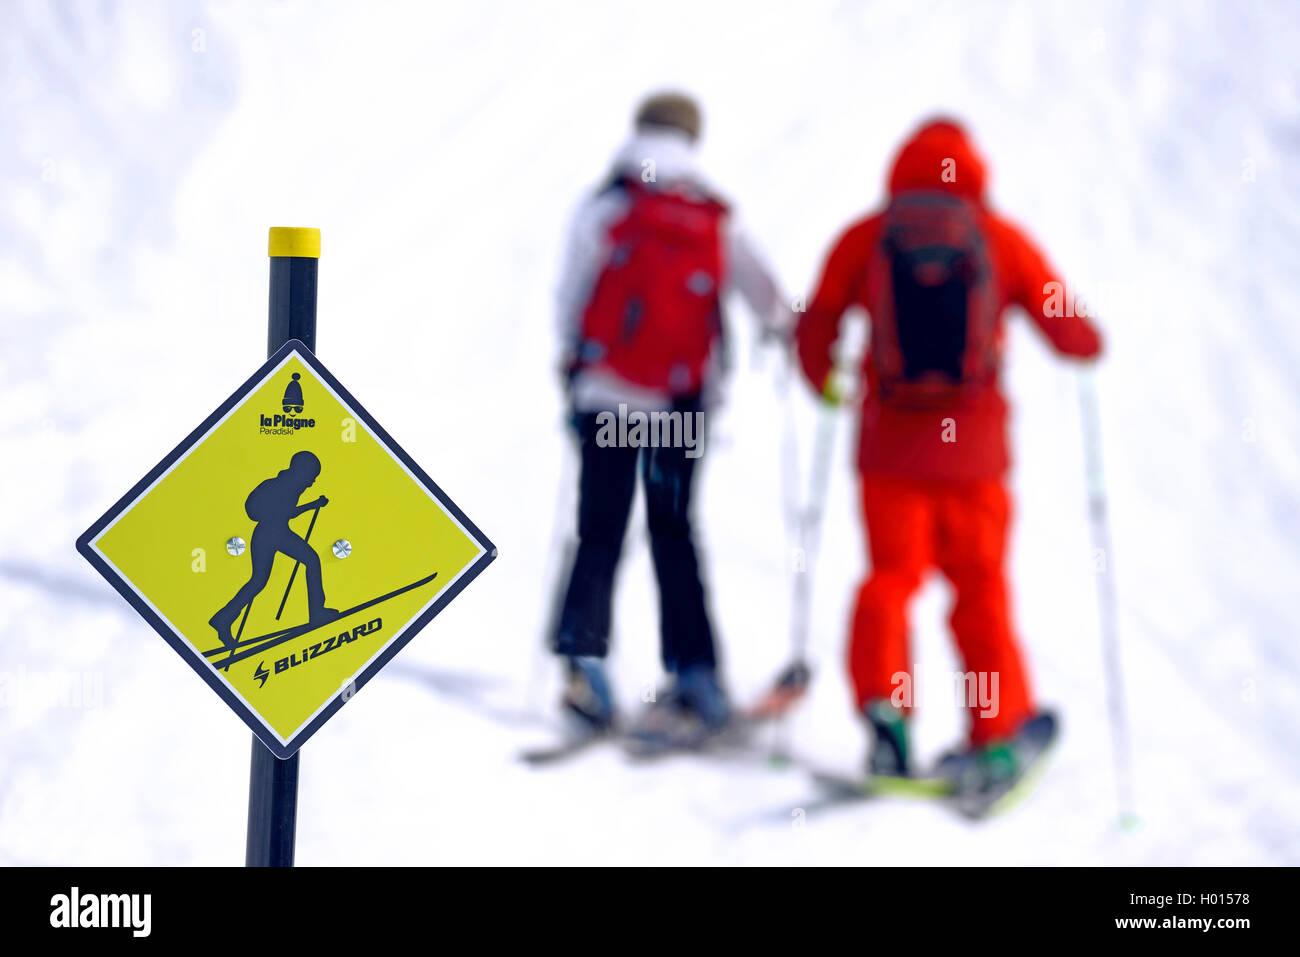 Beschilderung fuer Skiwanderer, Frankreich, Savoie, La Plagne | signpost for backcountry skiing, France, Savoie, - Stock Image